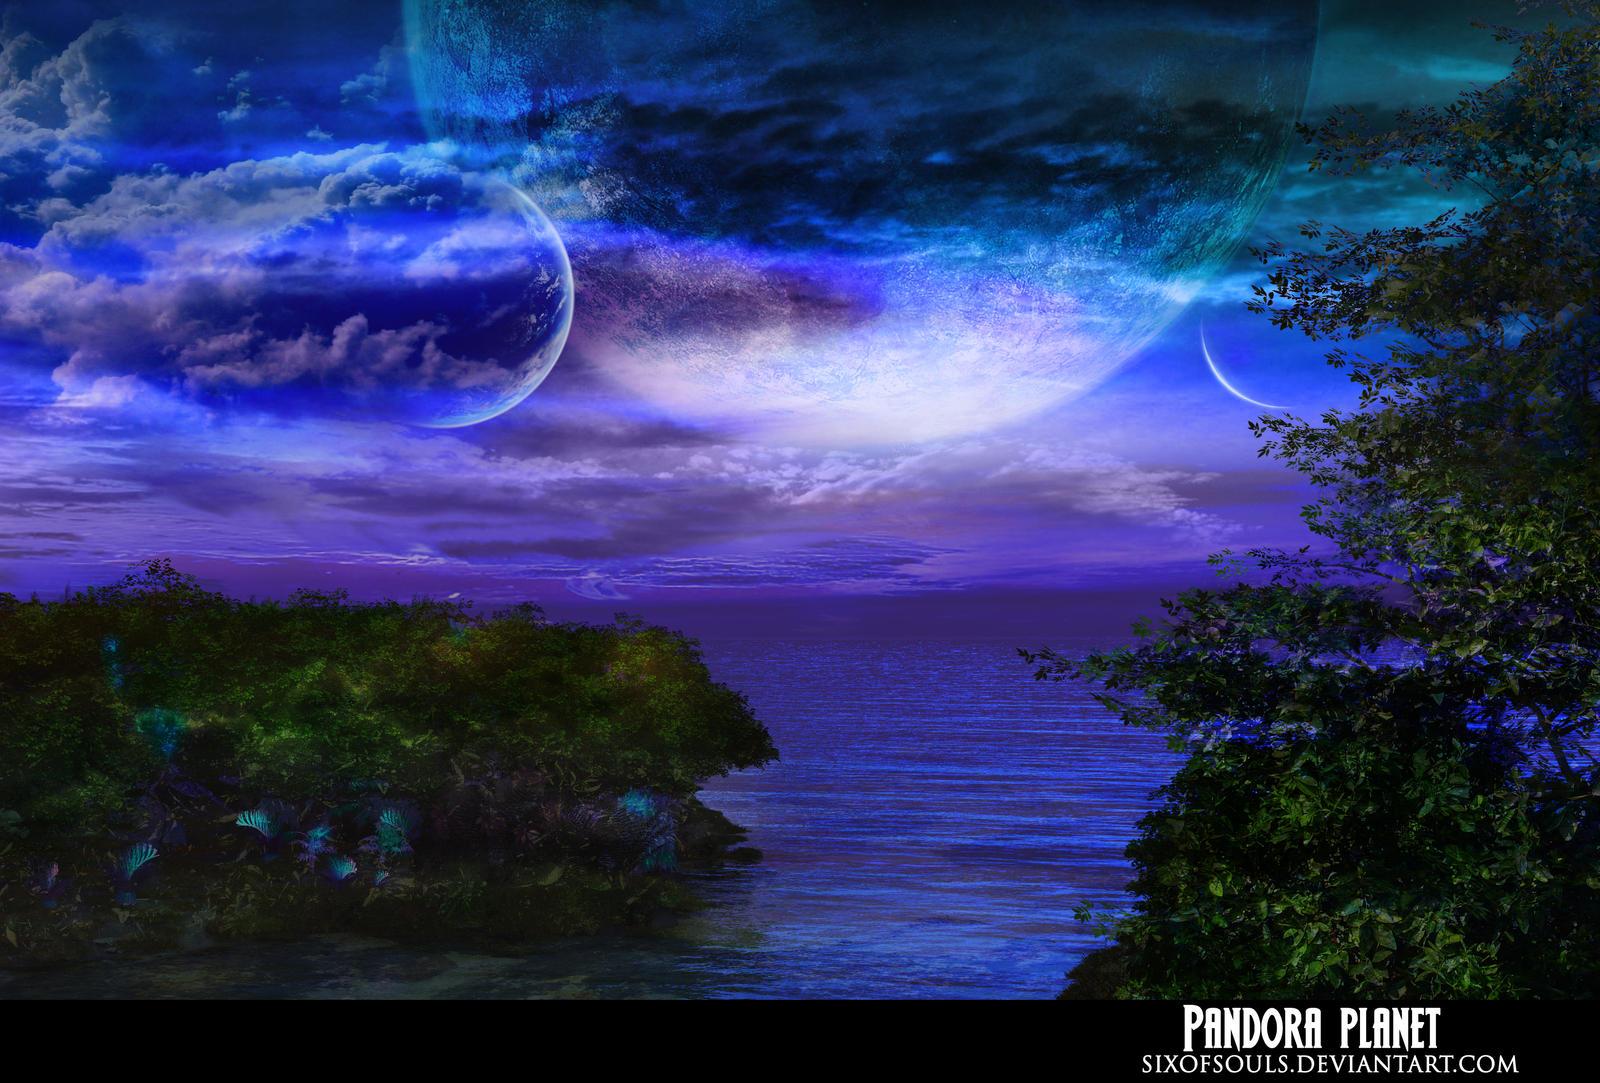 Morning on Pandora by sixofsouls on DeviantArt